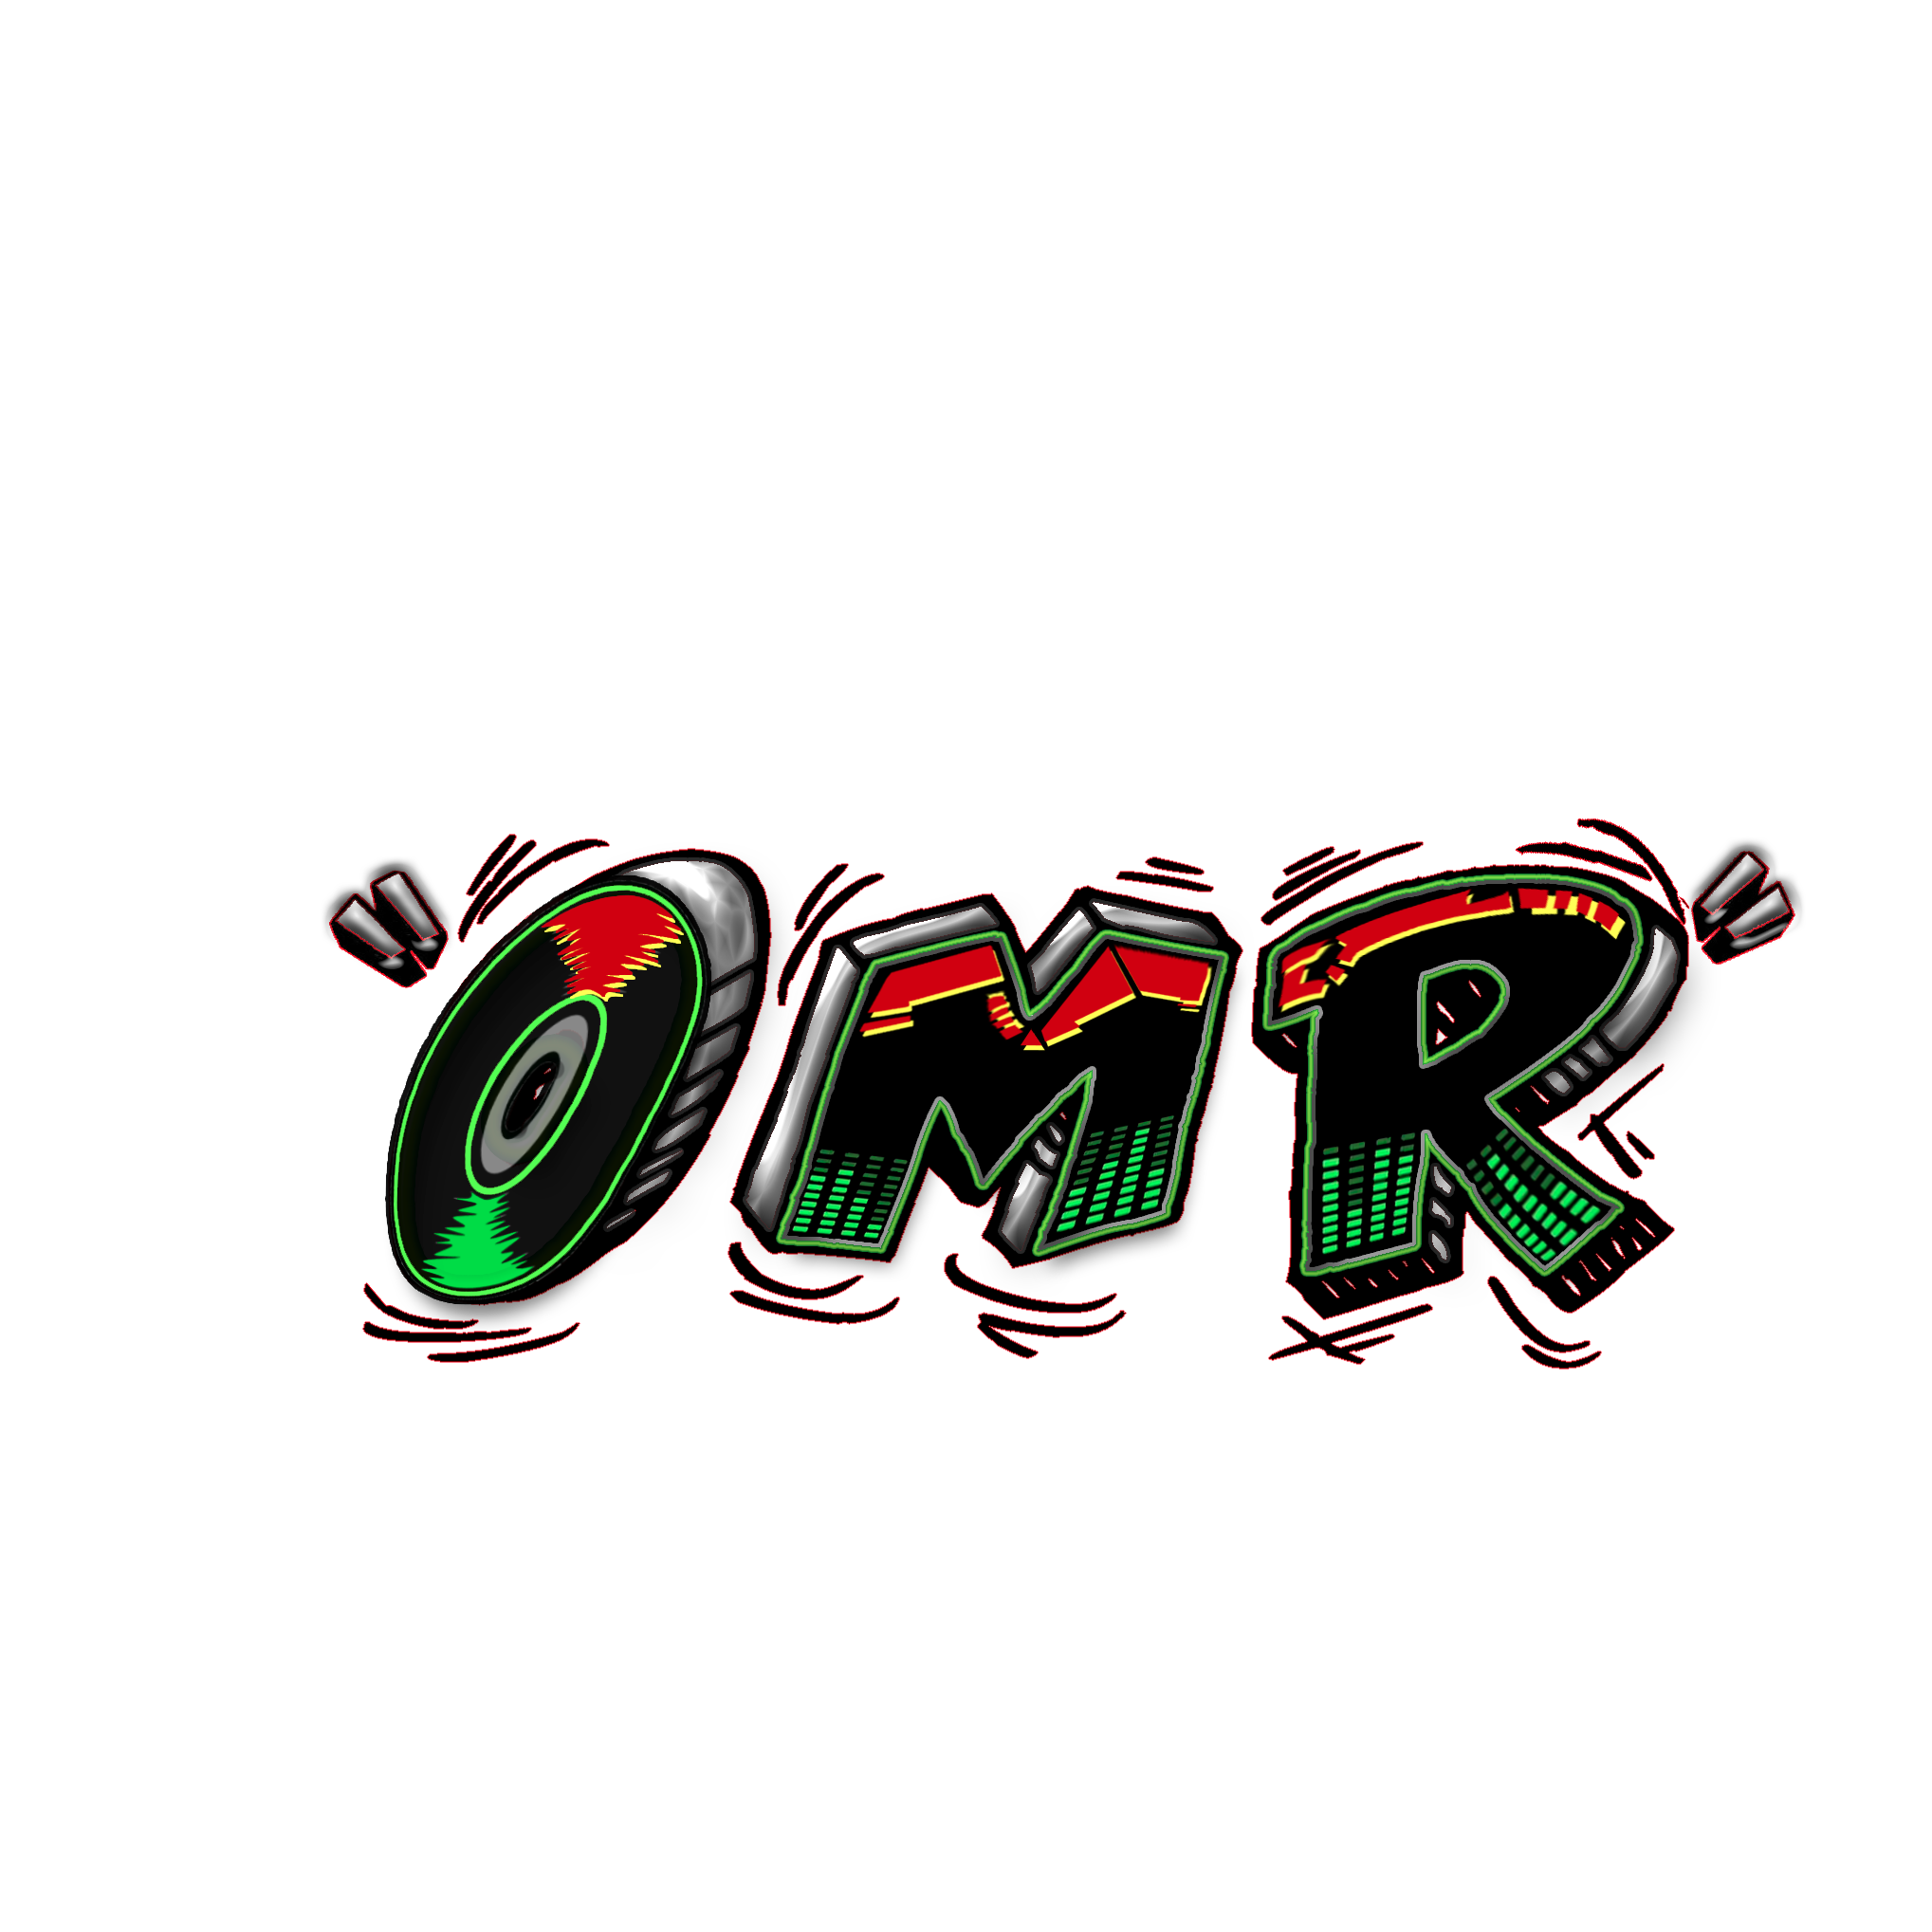 OMR Live